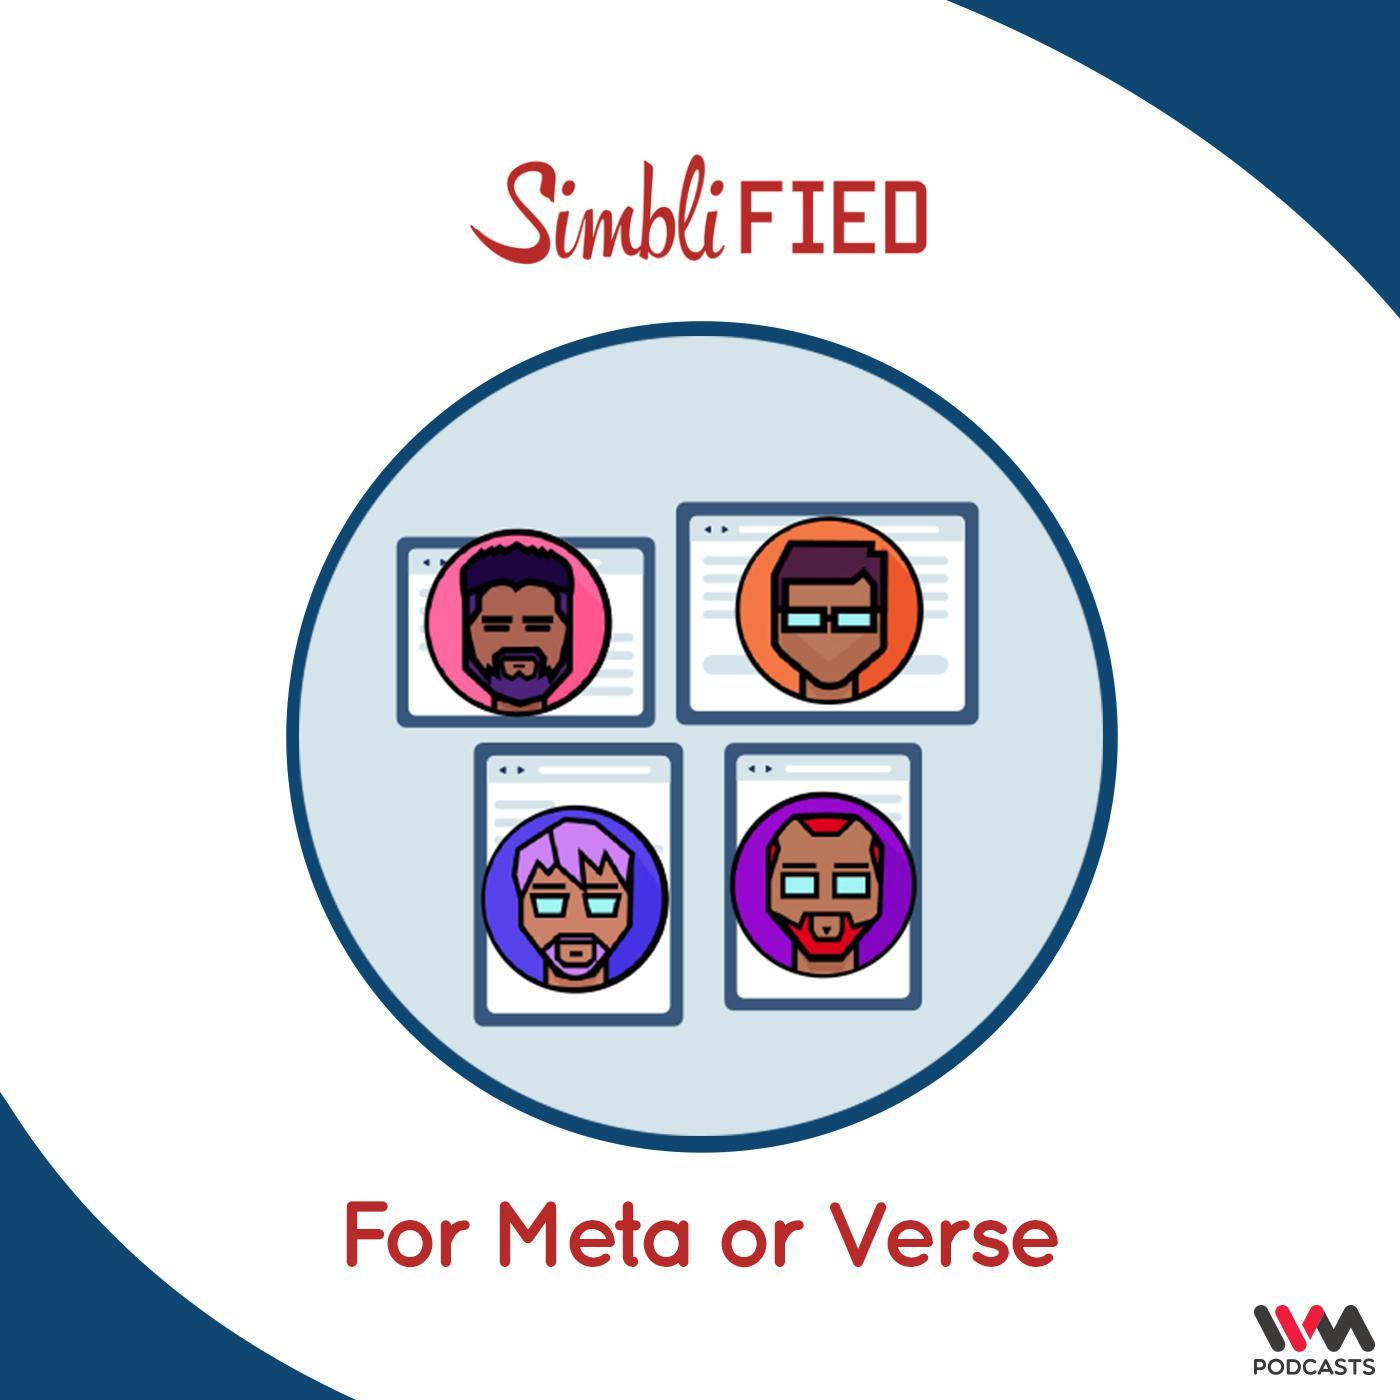 For Meta or Verse